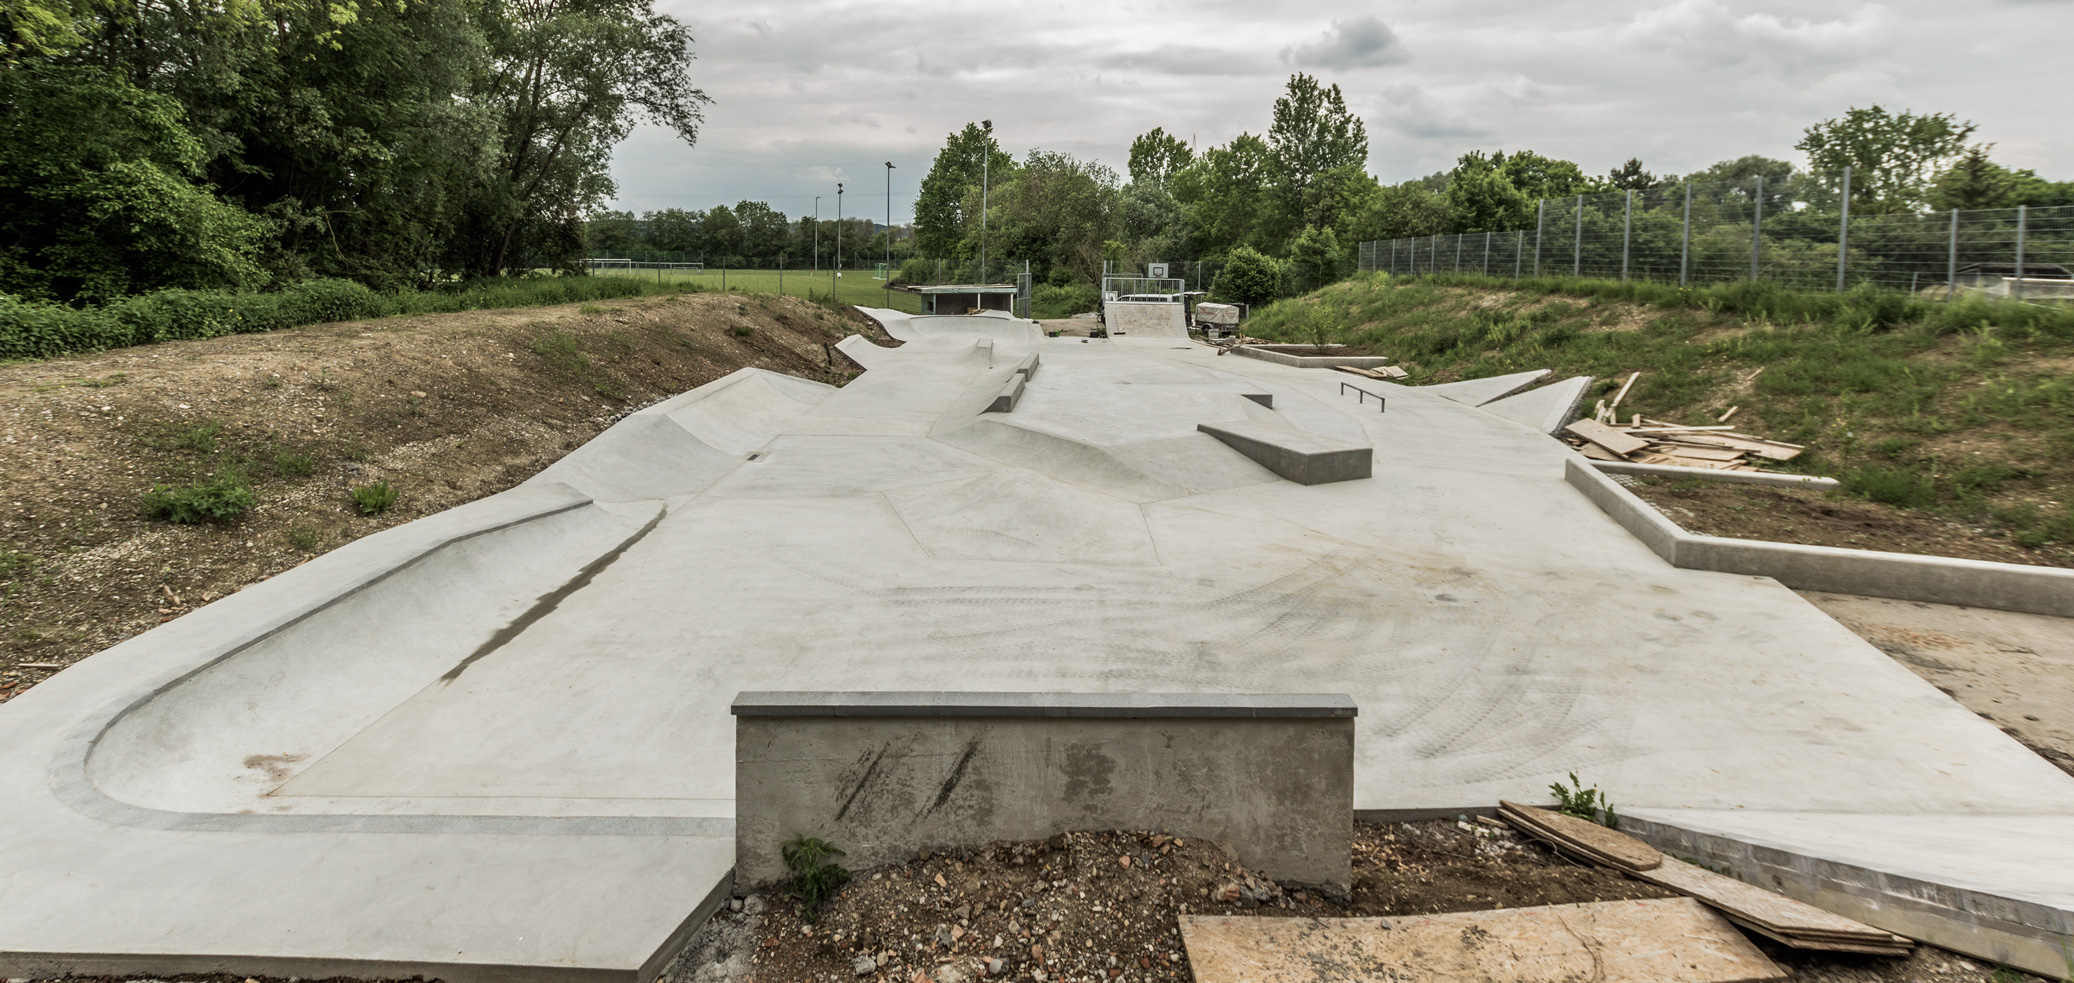 Skatepark-Augsburg_uebersicht2015